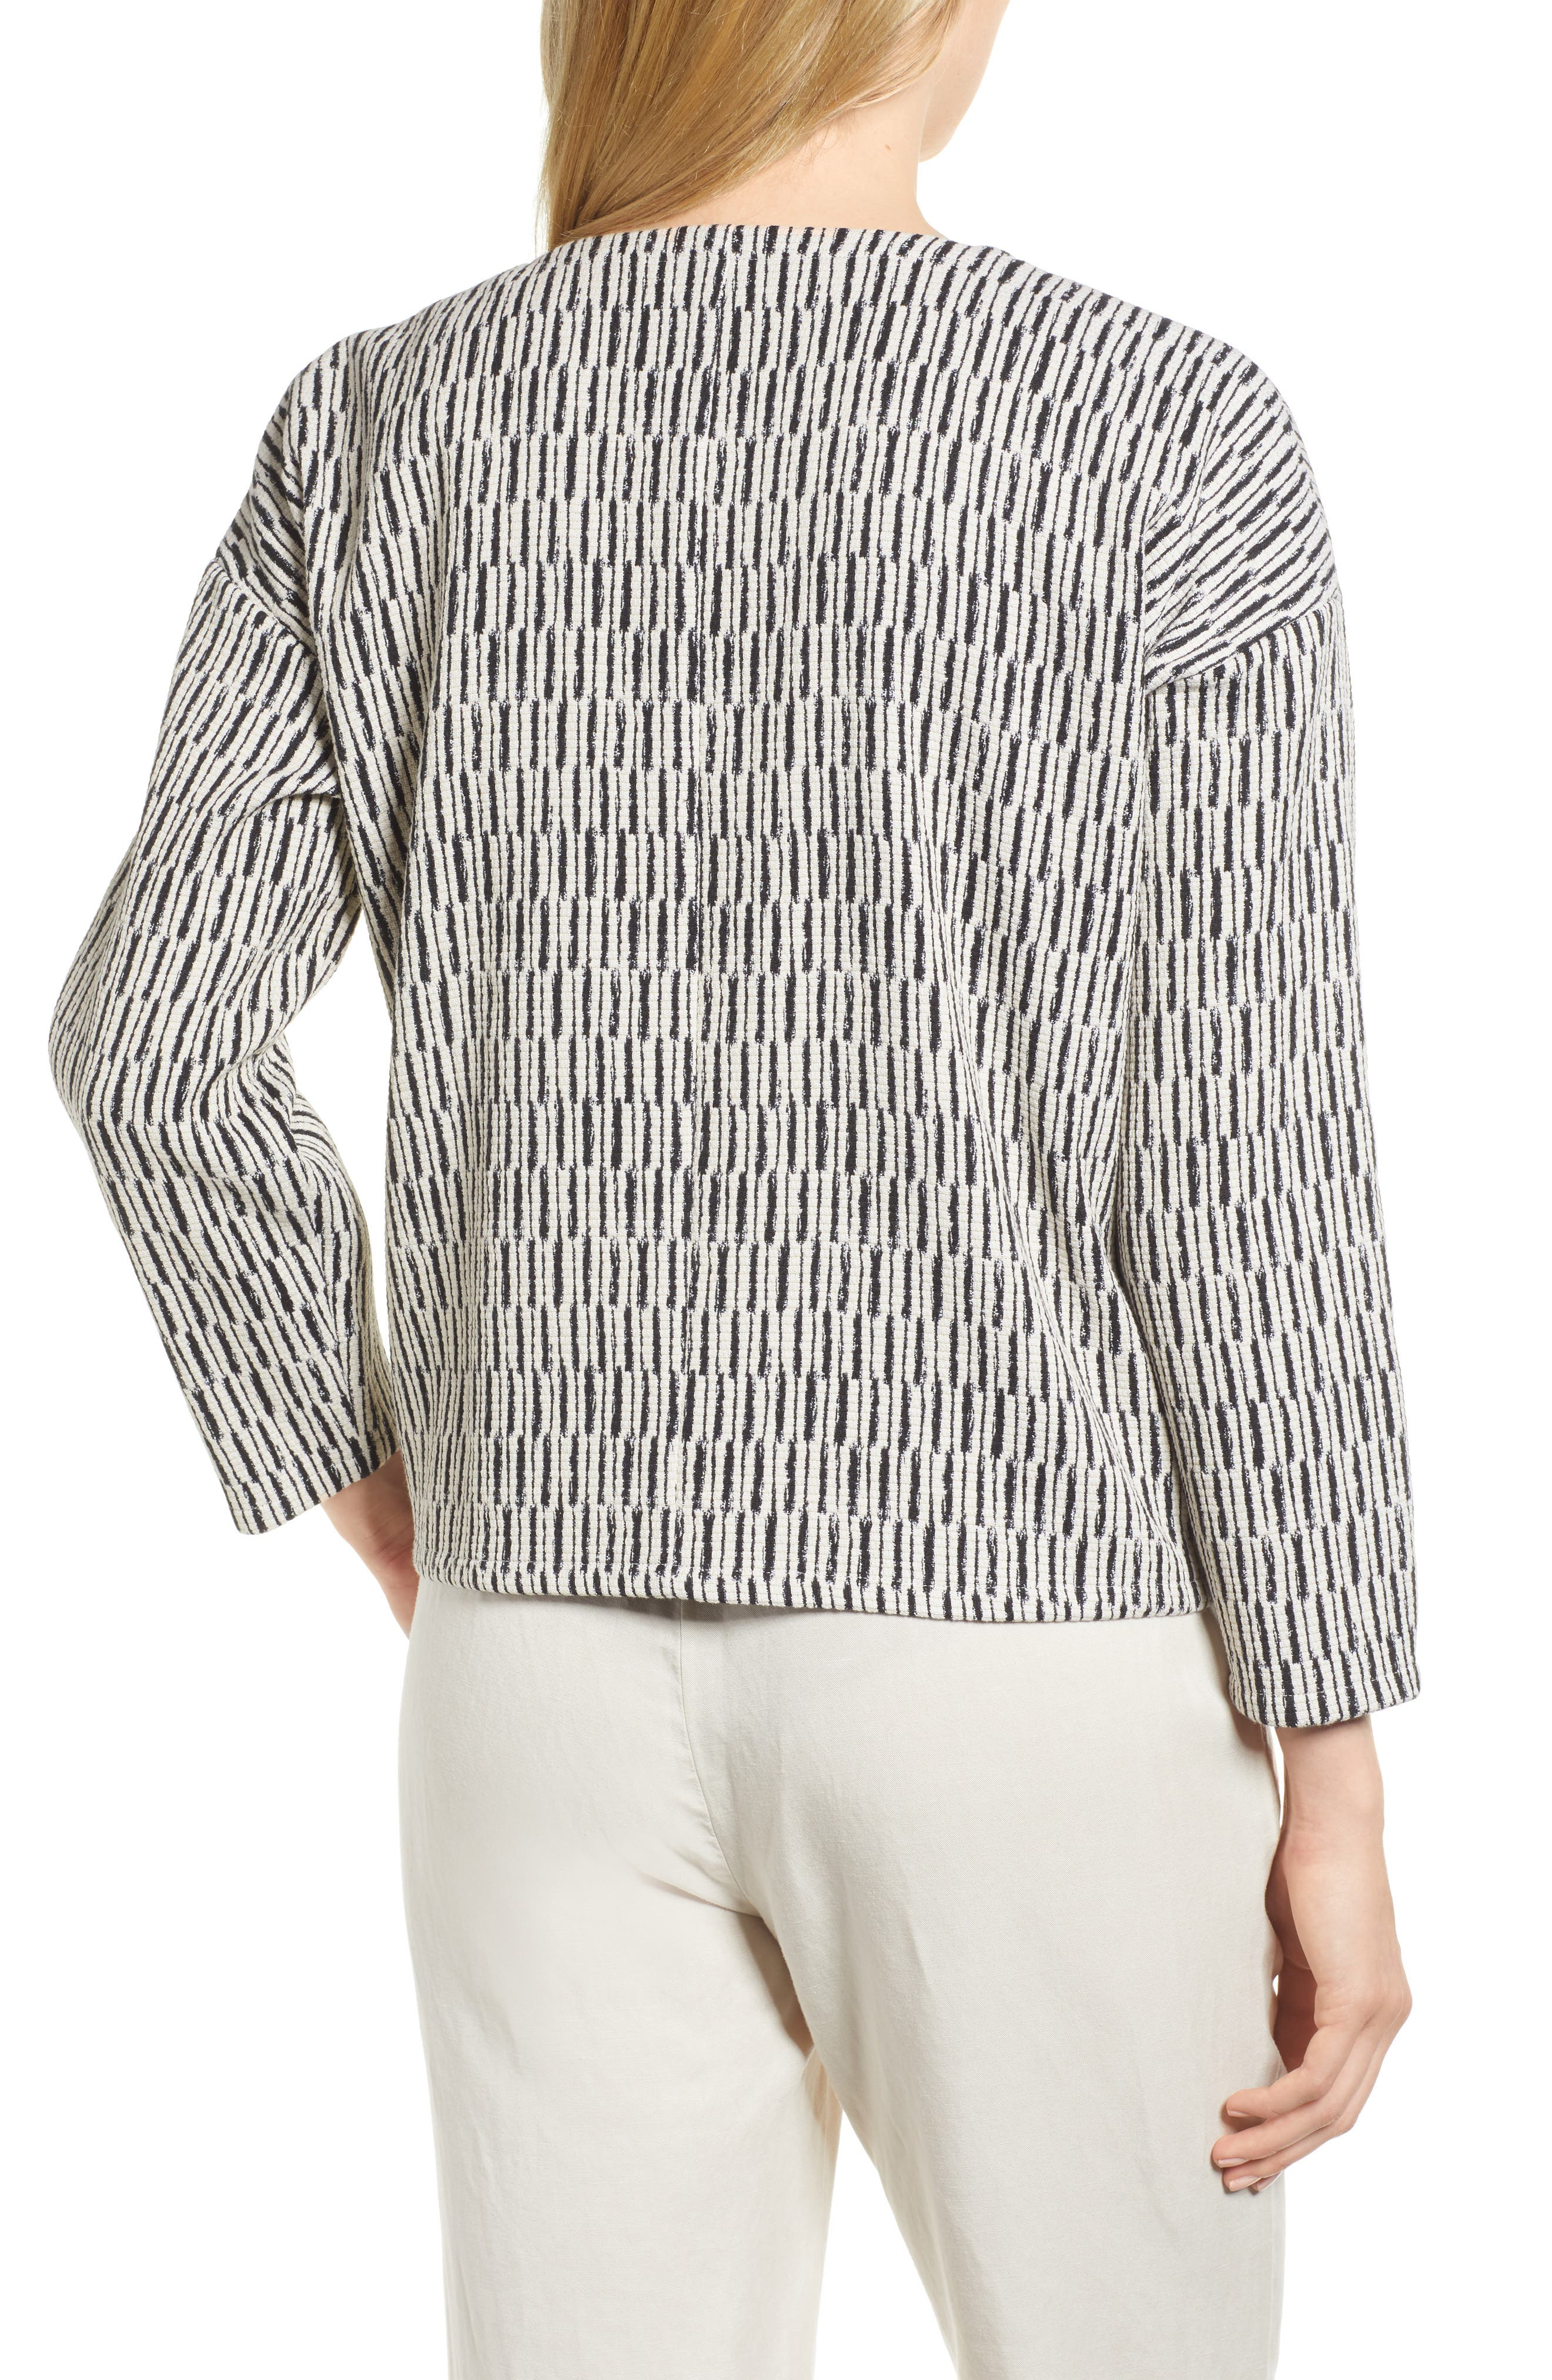 Tweed Jacket,                             Alternate thumbnail 2, color,                             Black/ White